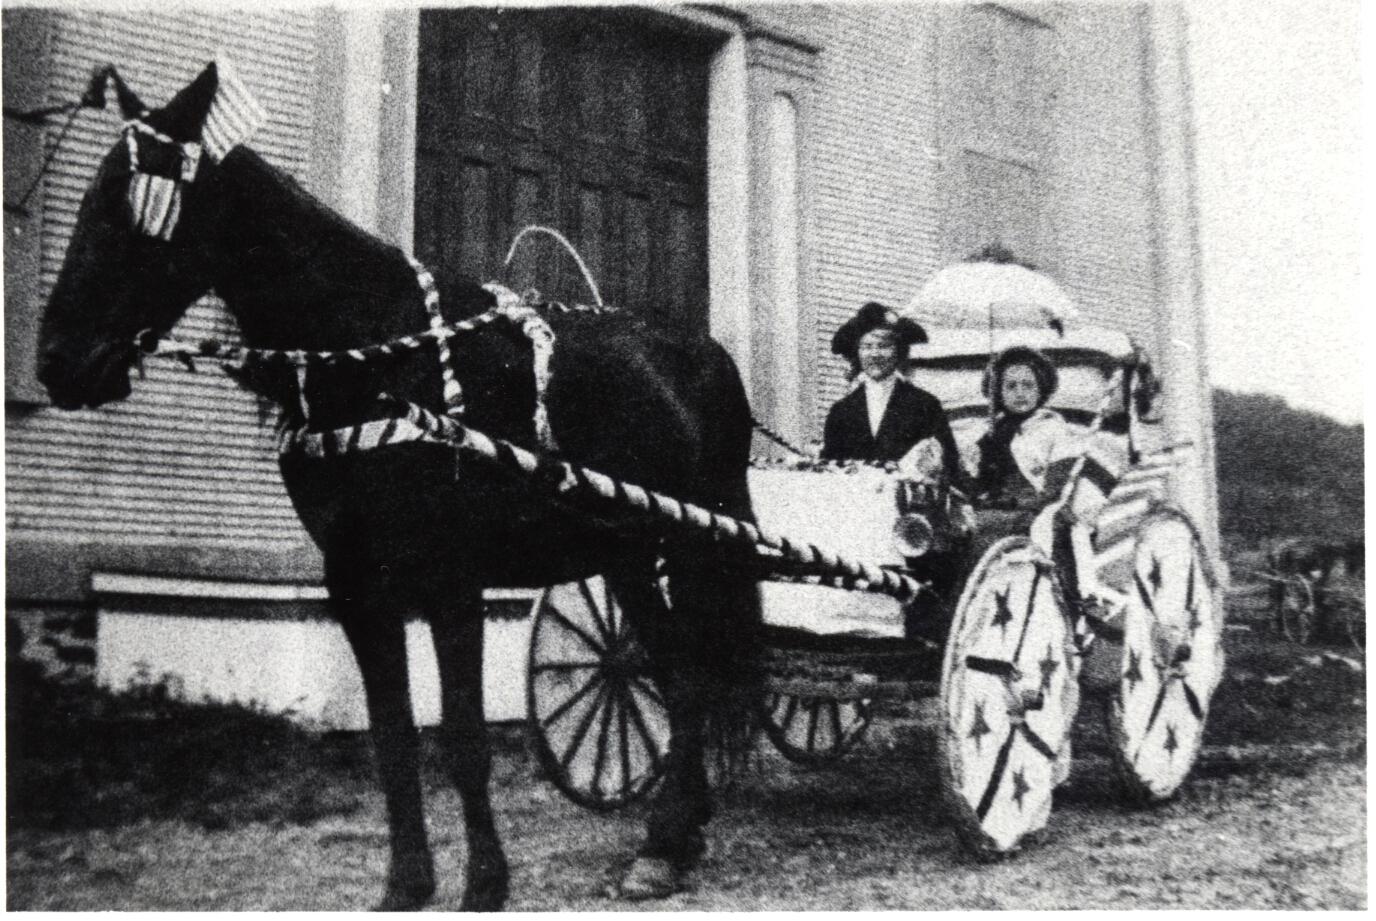 4th parade horse-buggy